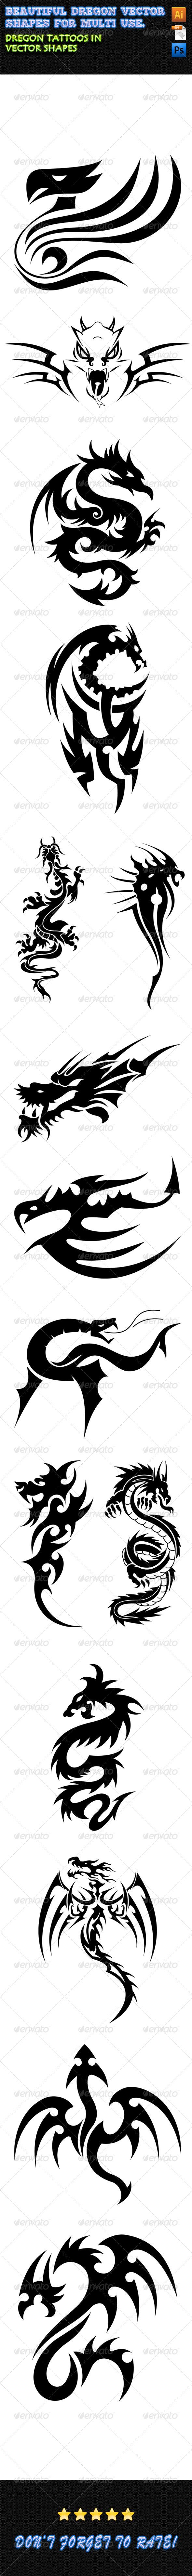 GraphicRiver Dragon Tattoos 01 7847038